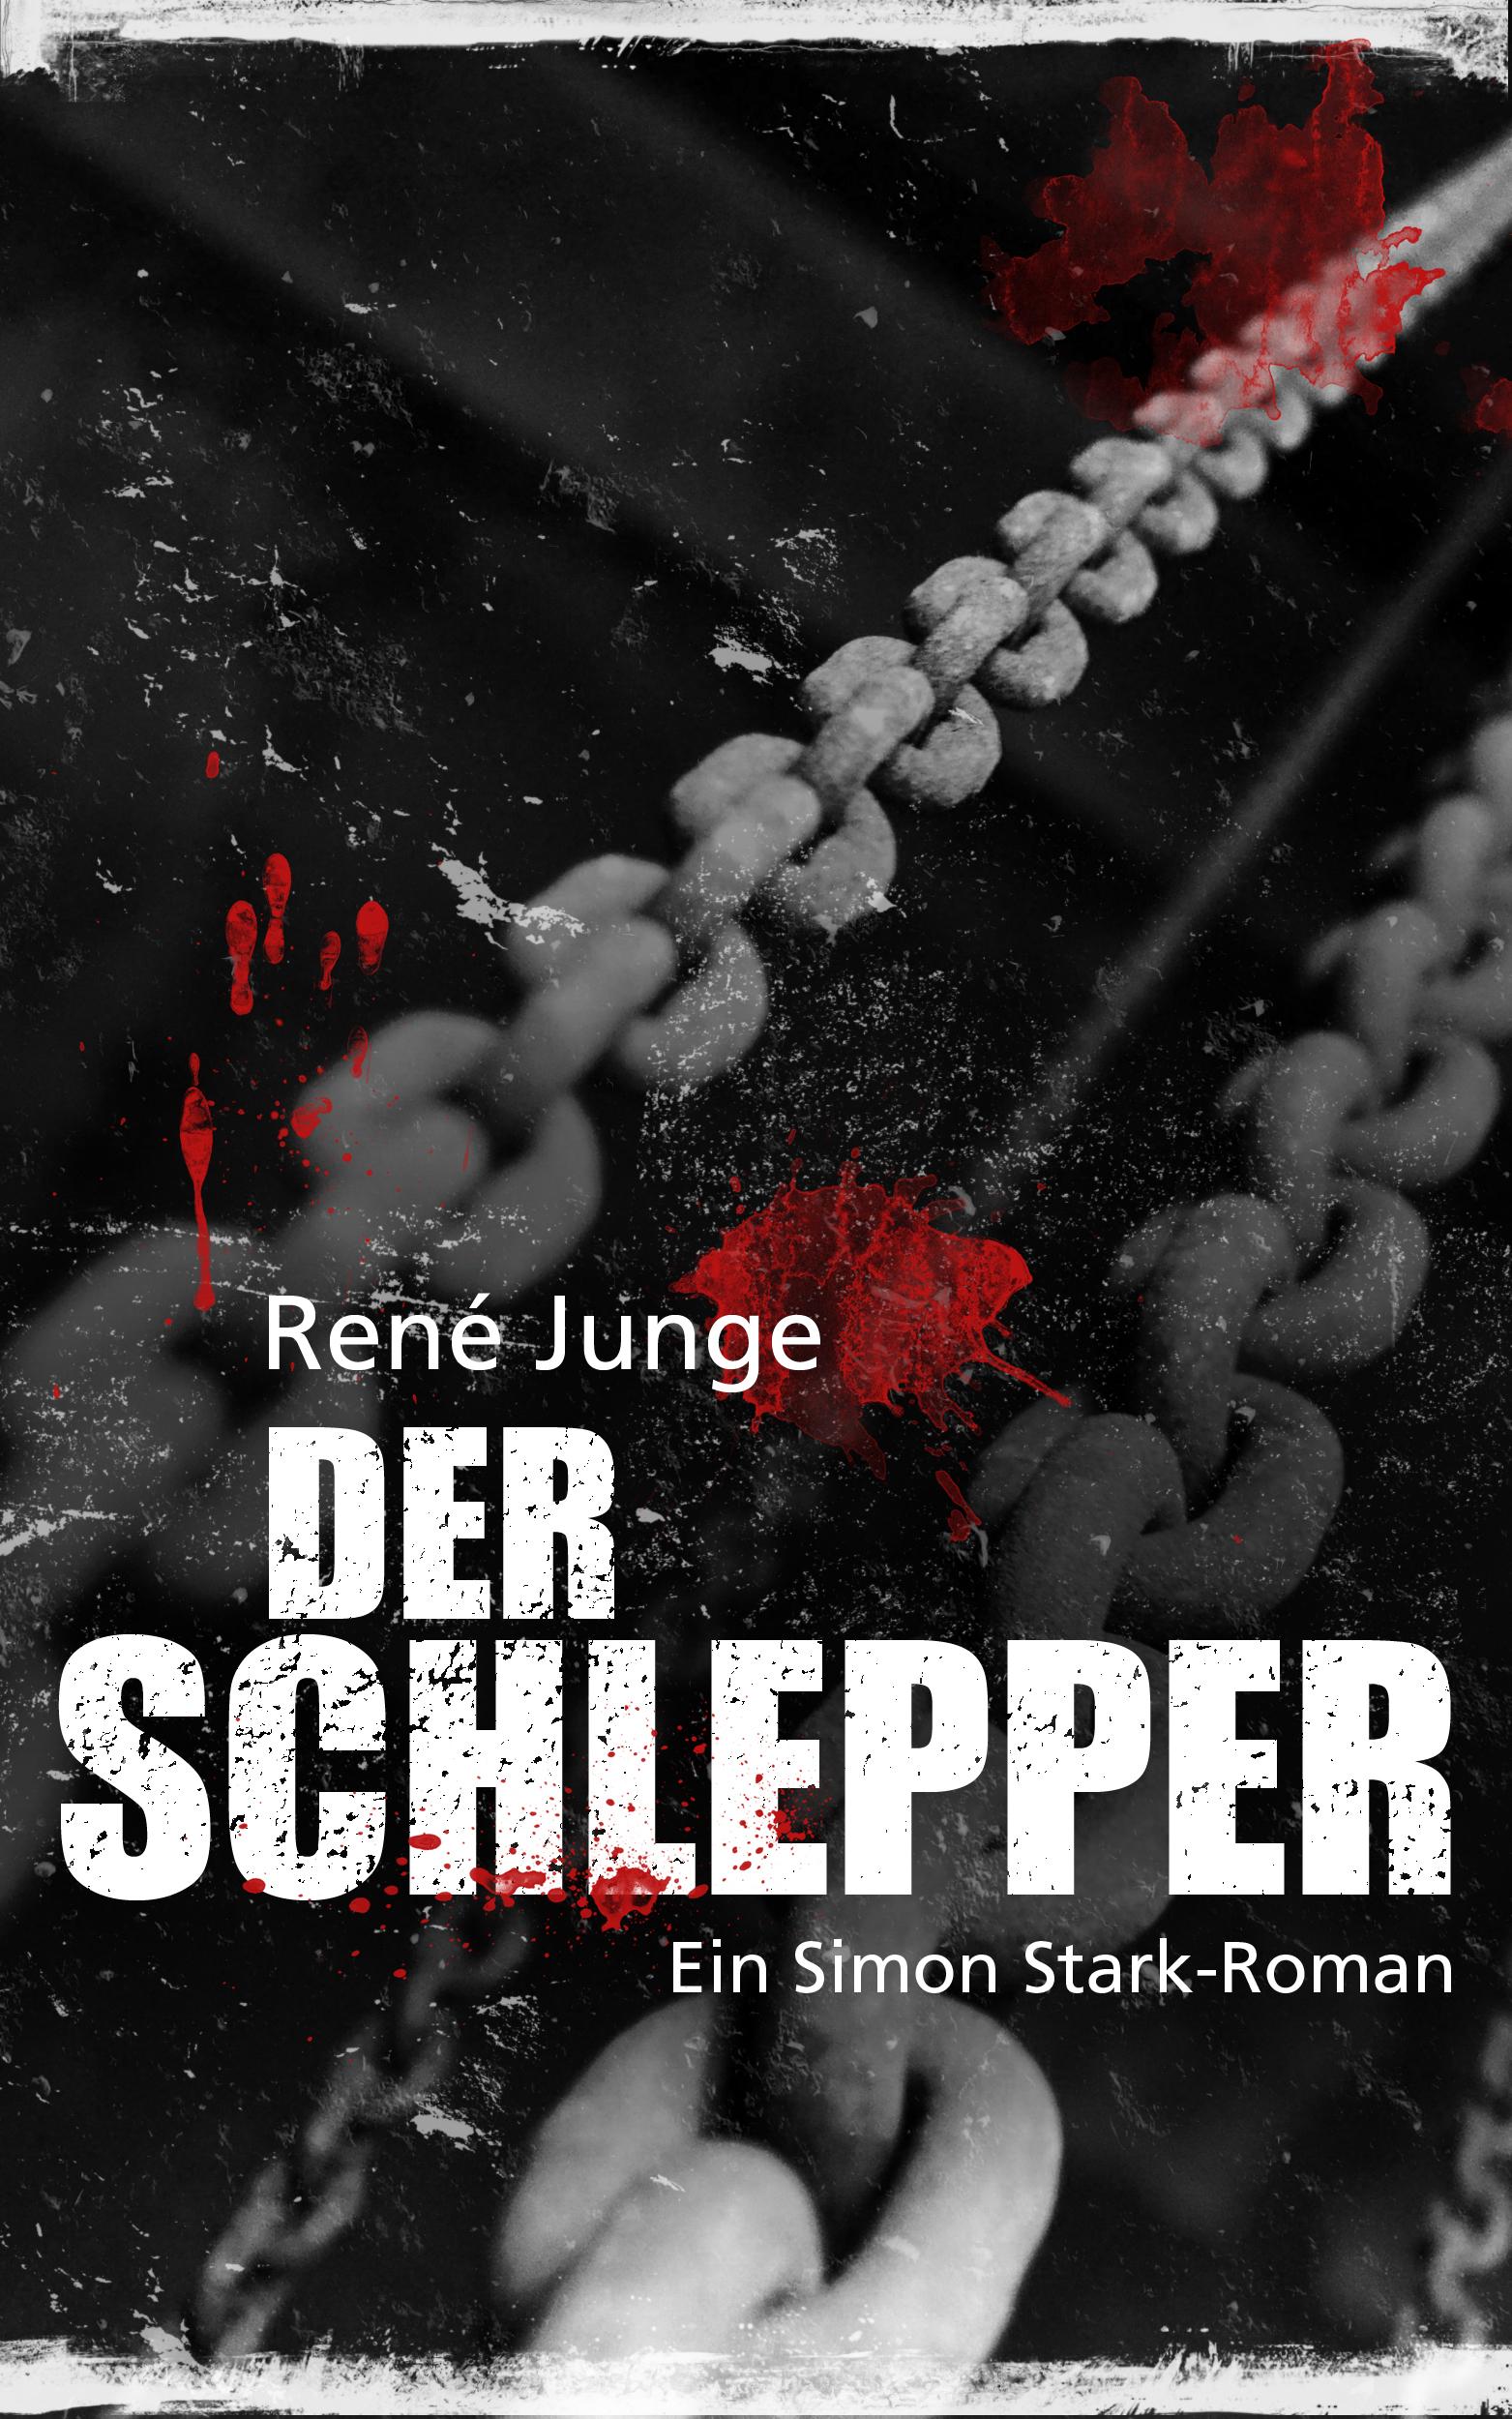 René Junge: Isolatiou – Im Visier des Killers